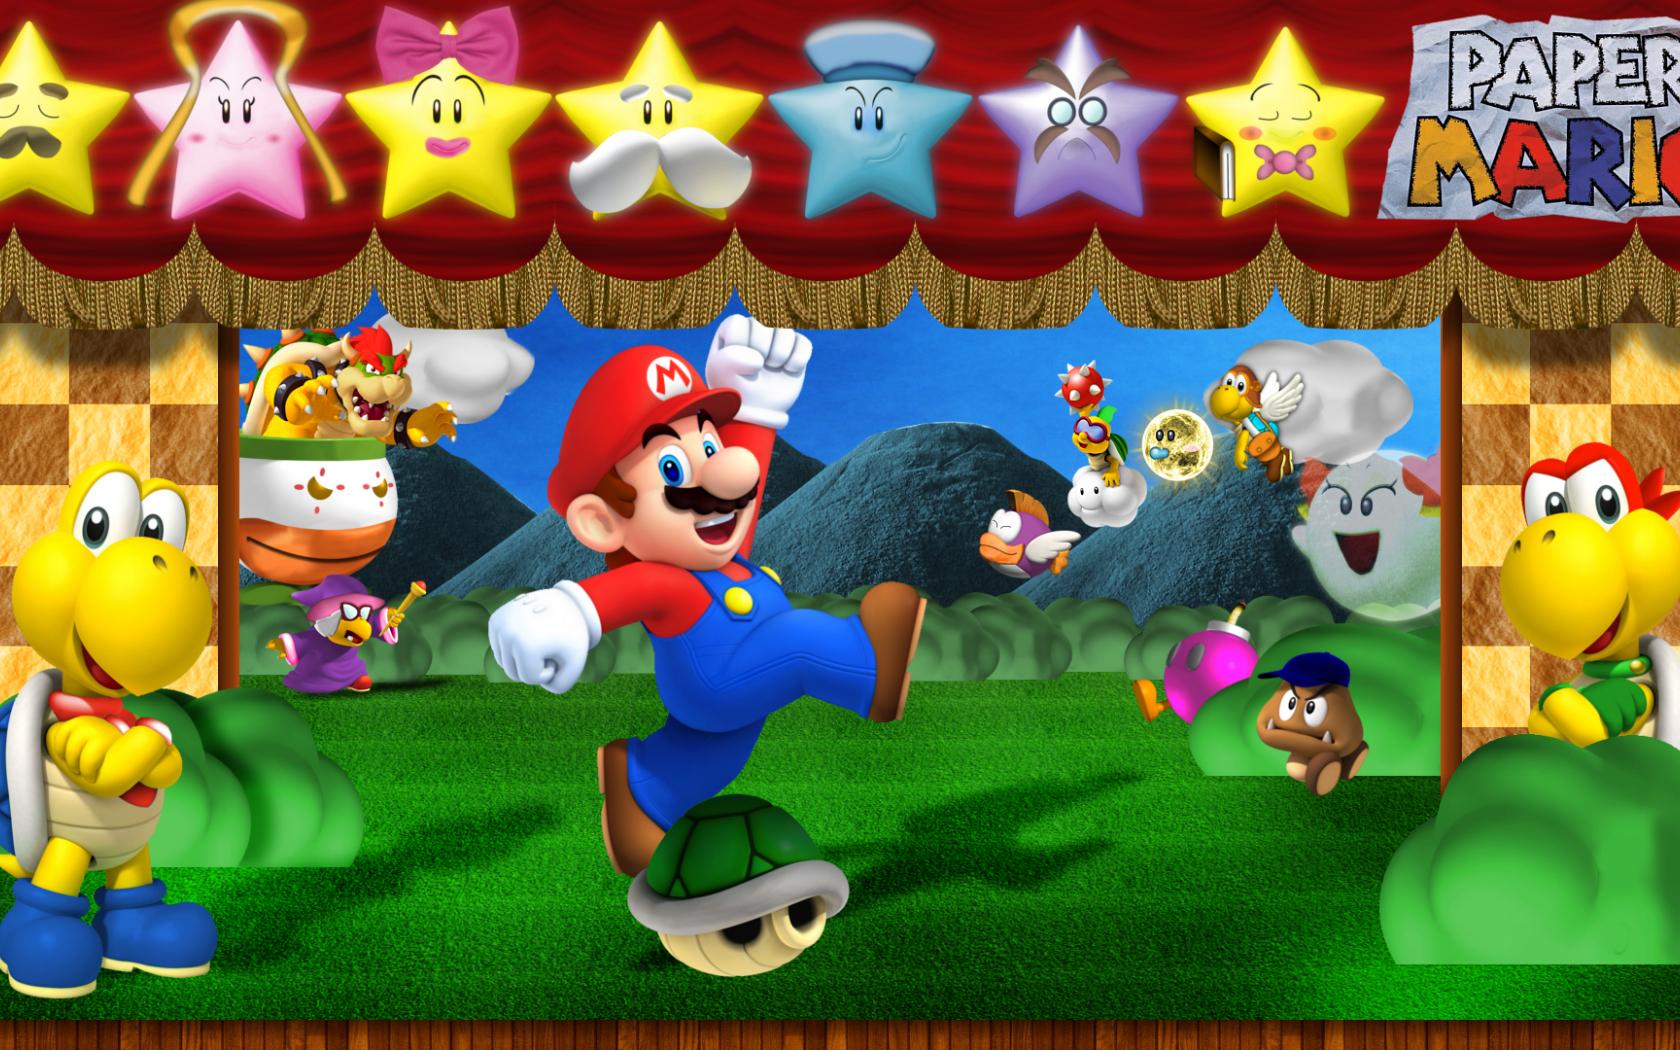 Free Download Paper Mario The Thousand Year Door Wallpaper Paper